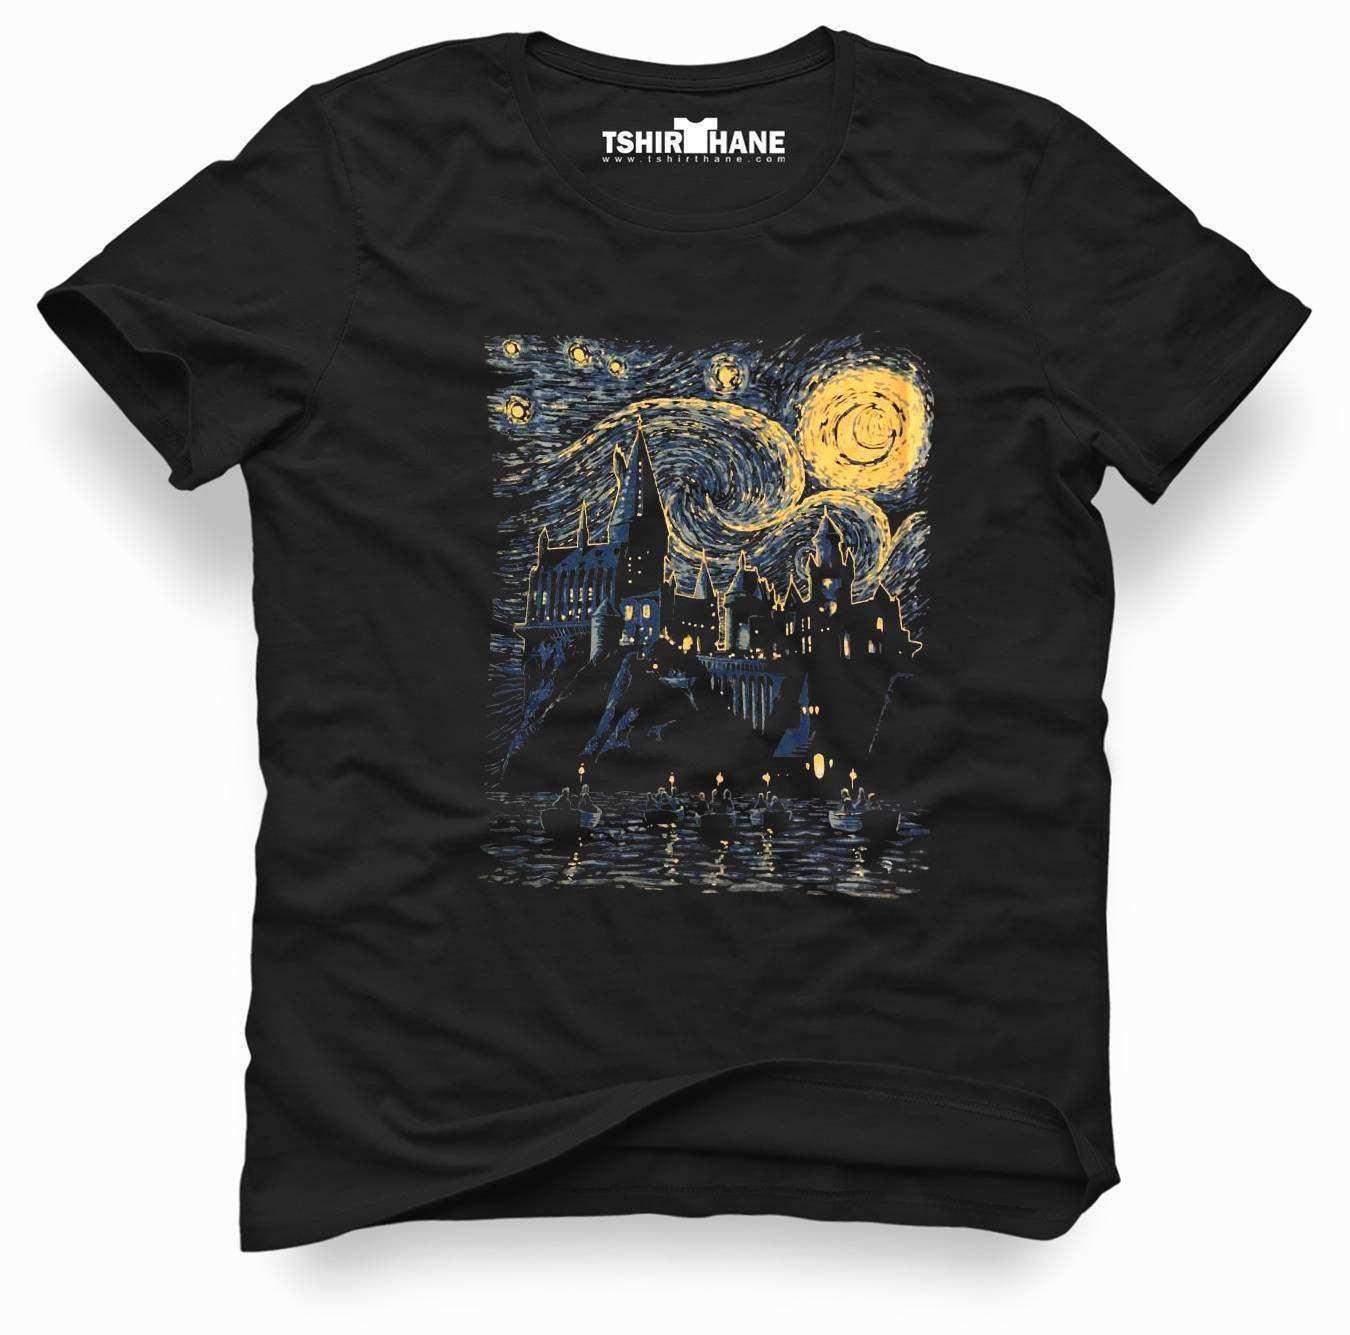 H P Touz Van Gogh Erkek Baskılı Siyah Tshirt